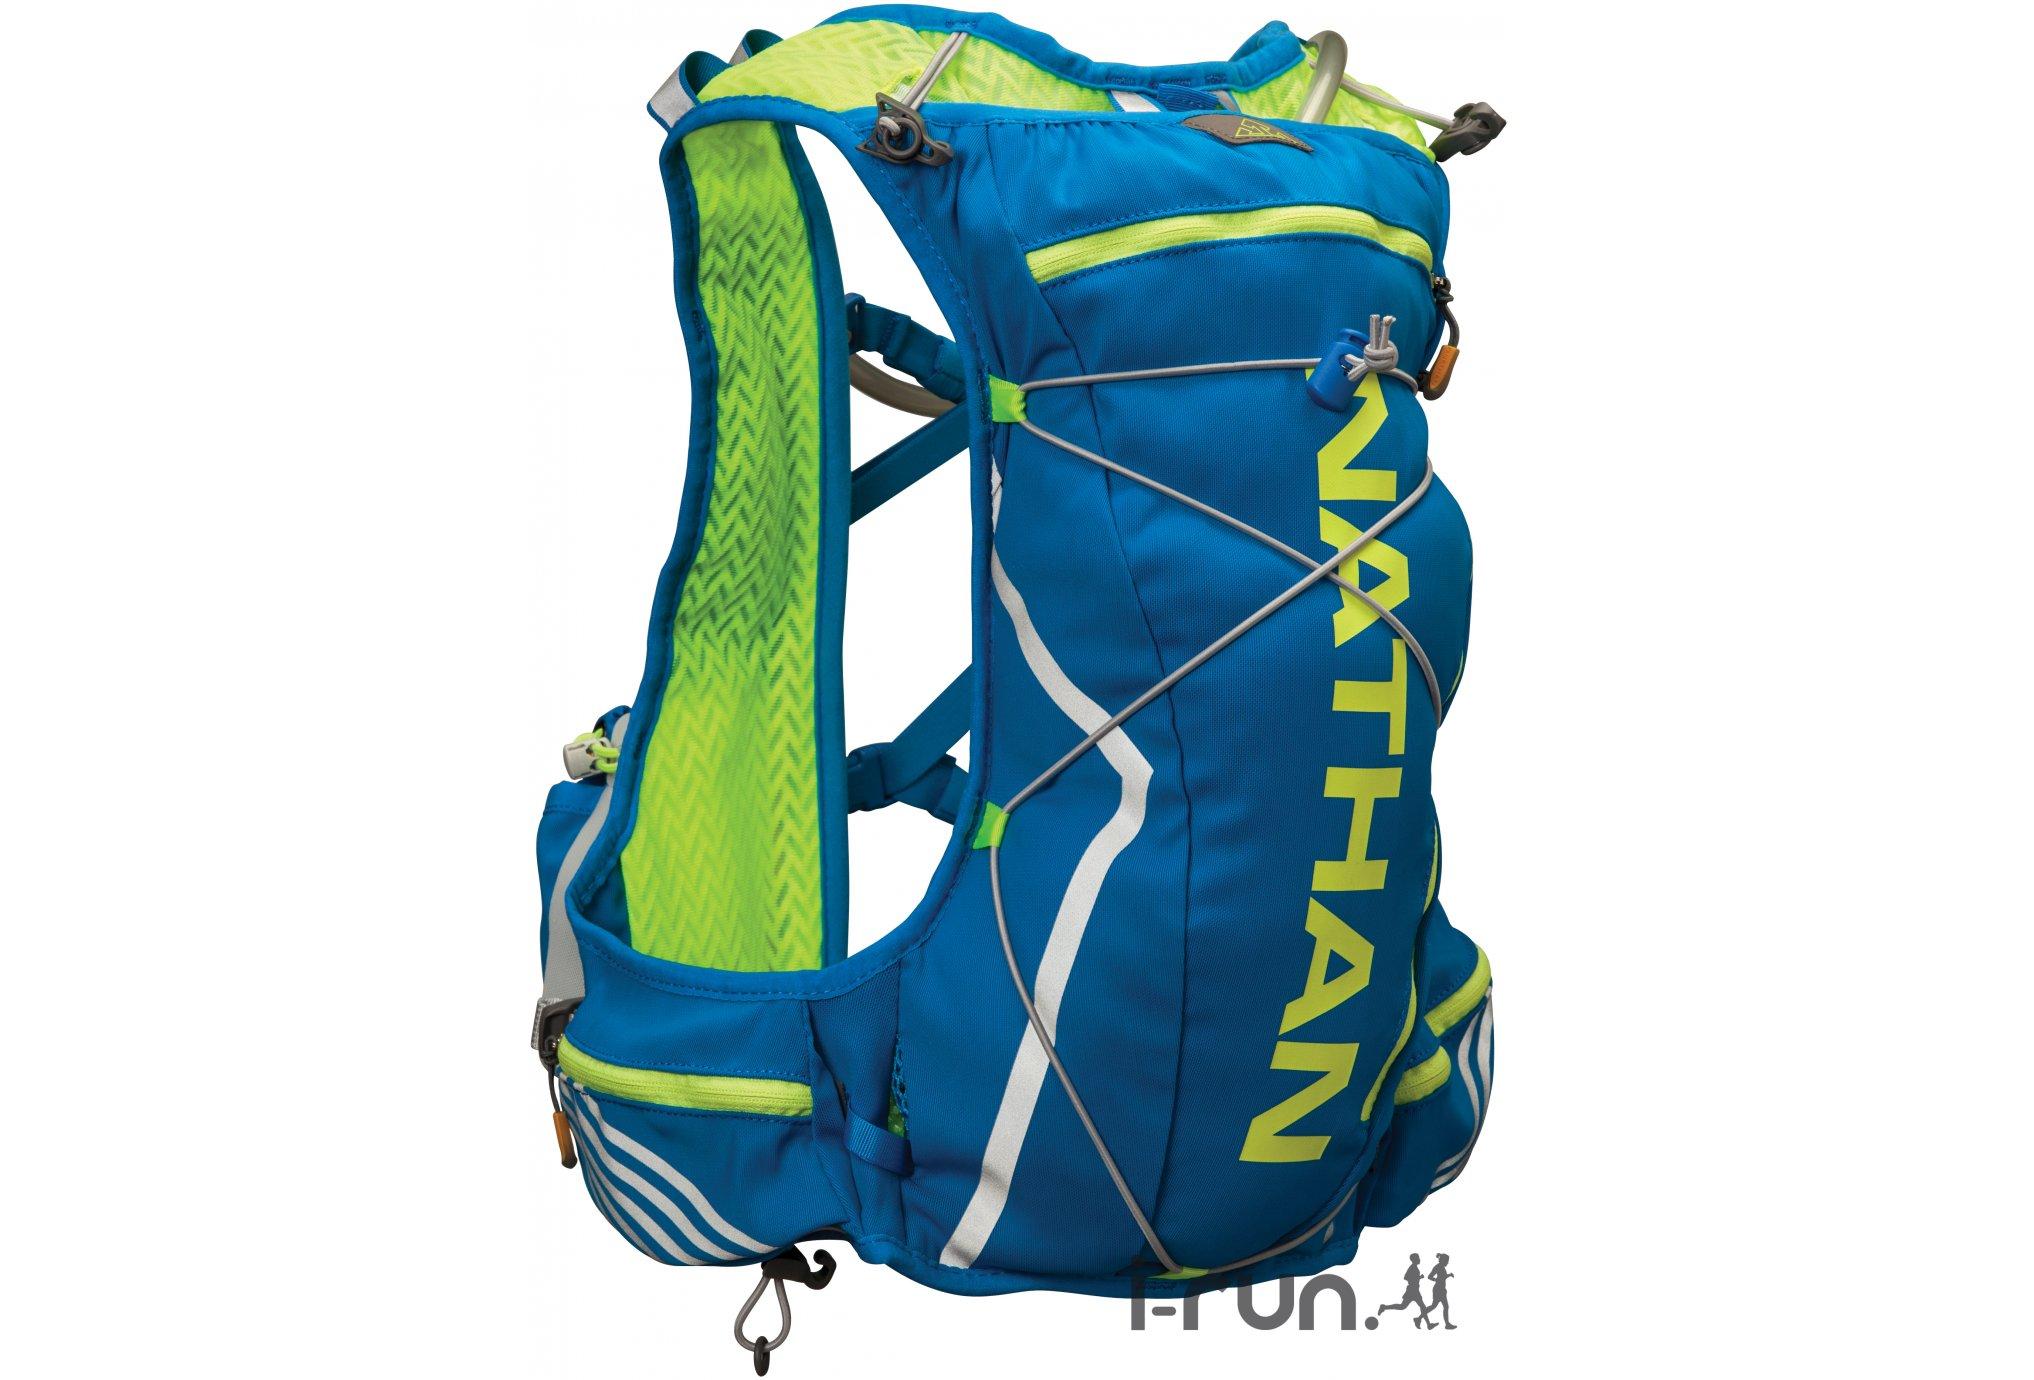 Nathan Hydrobag vaporcloud hydratation / sacs à dos